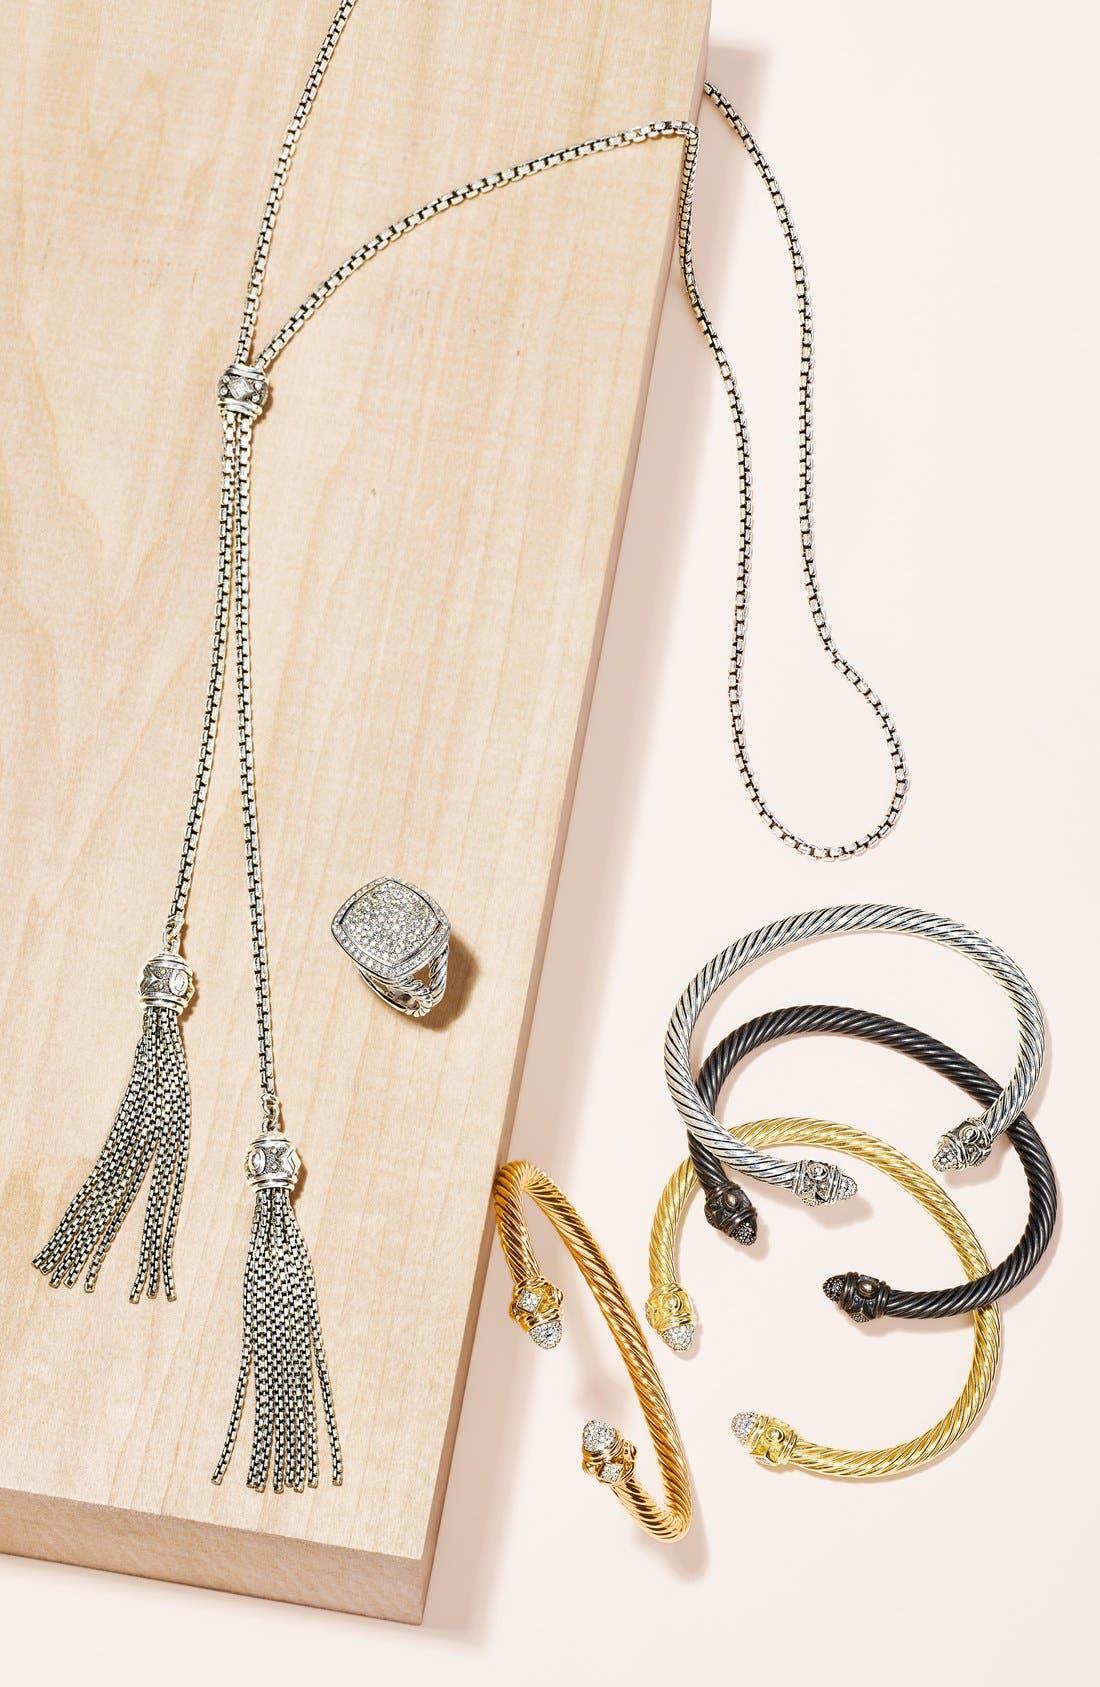 Renaissance Bracelet with Diamonds in Silver, 5mm,                             Alternate thumbnail 3, color,                             DIAMOND